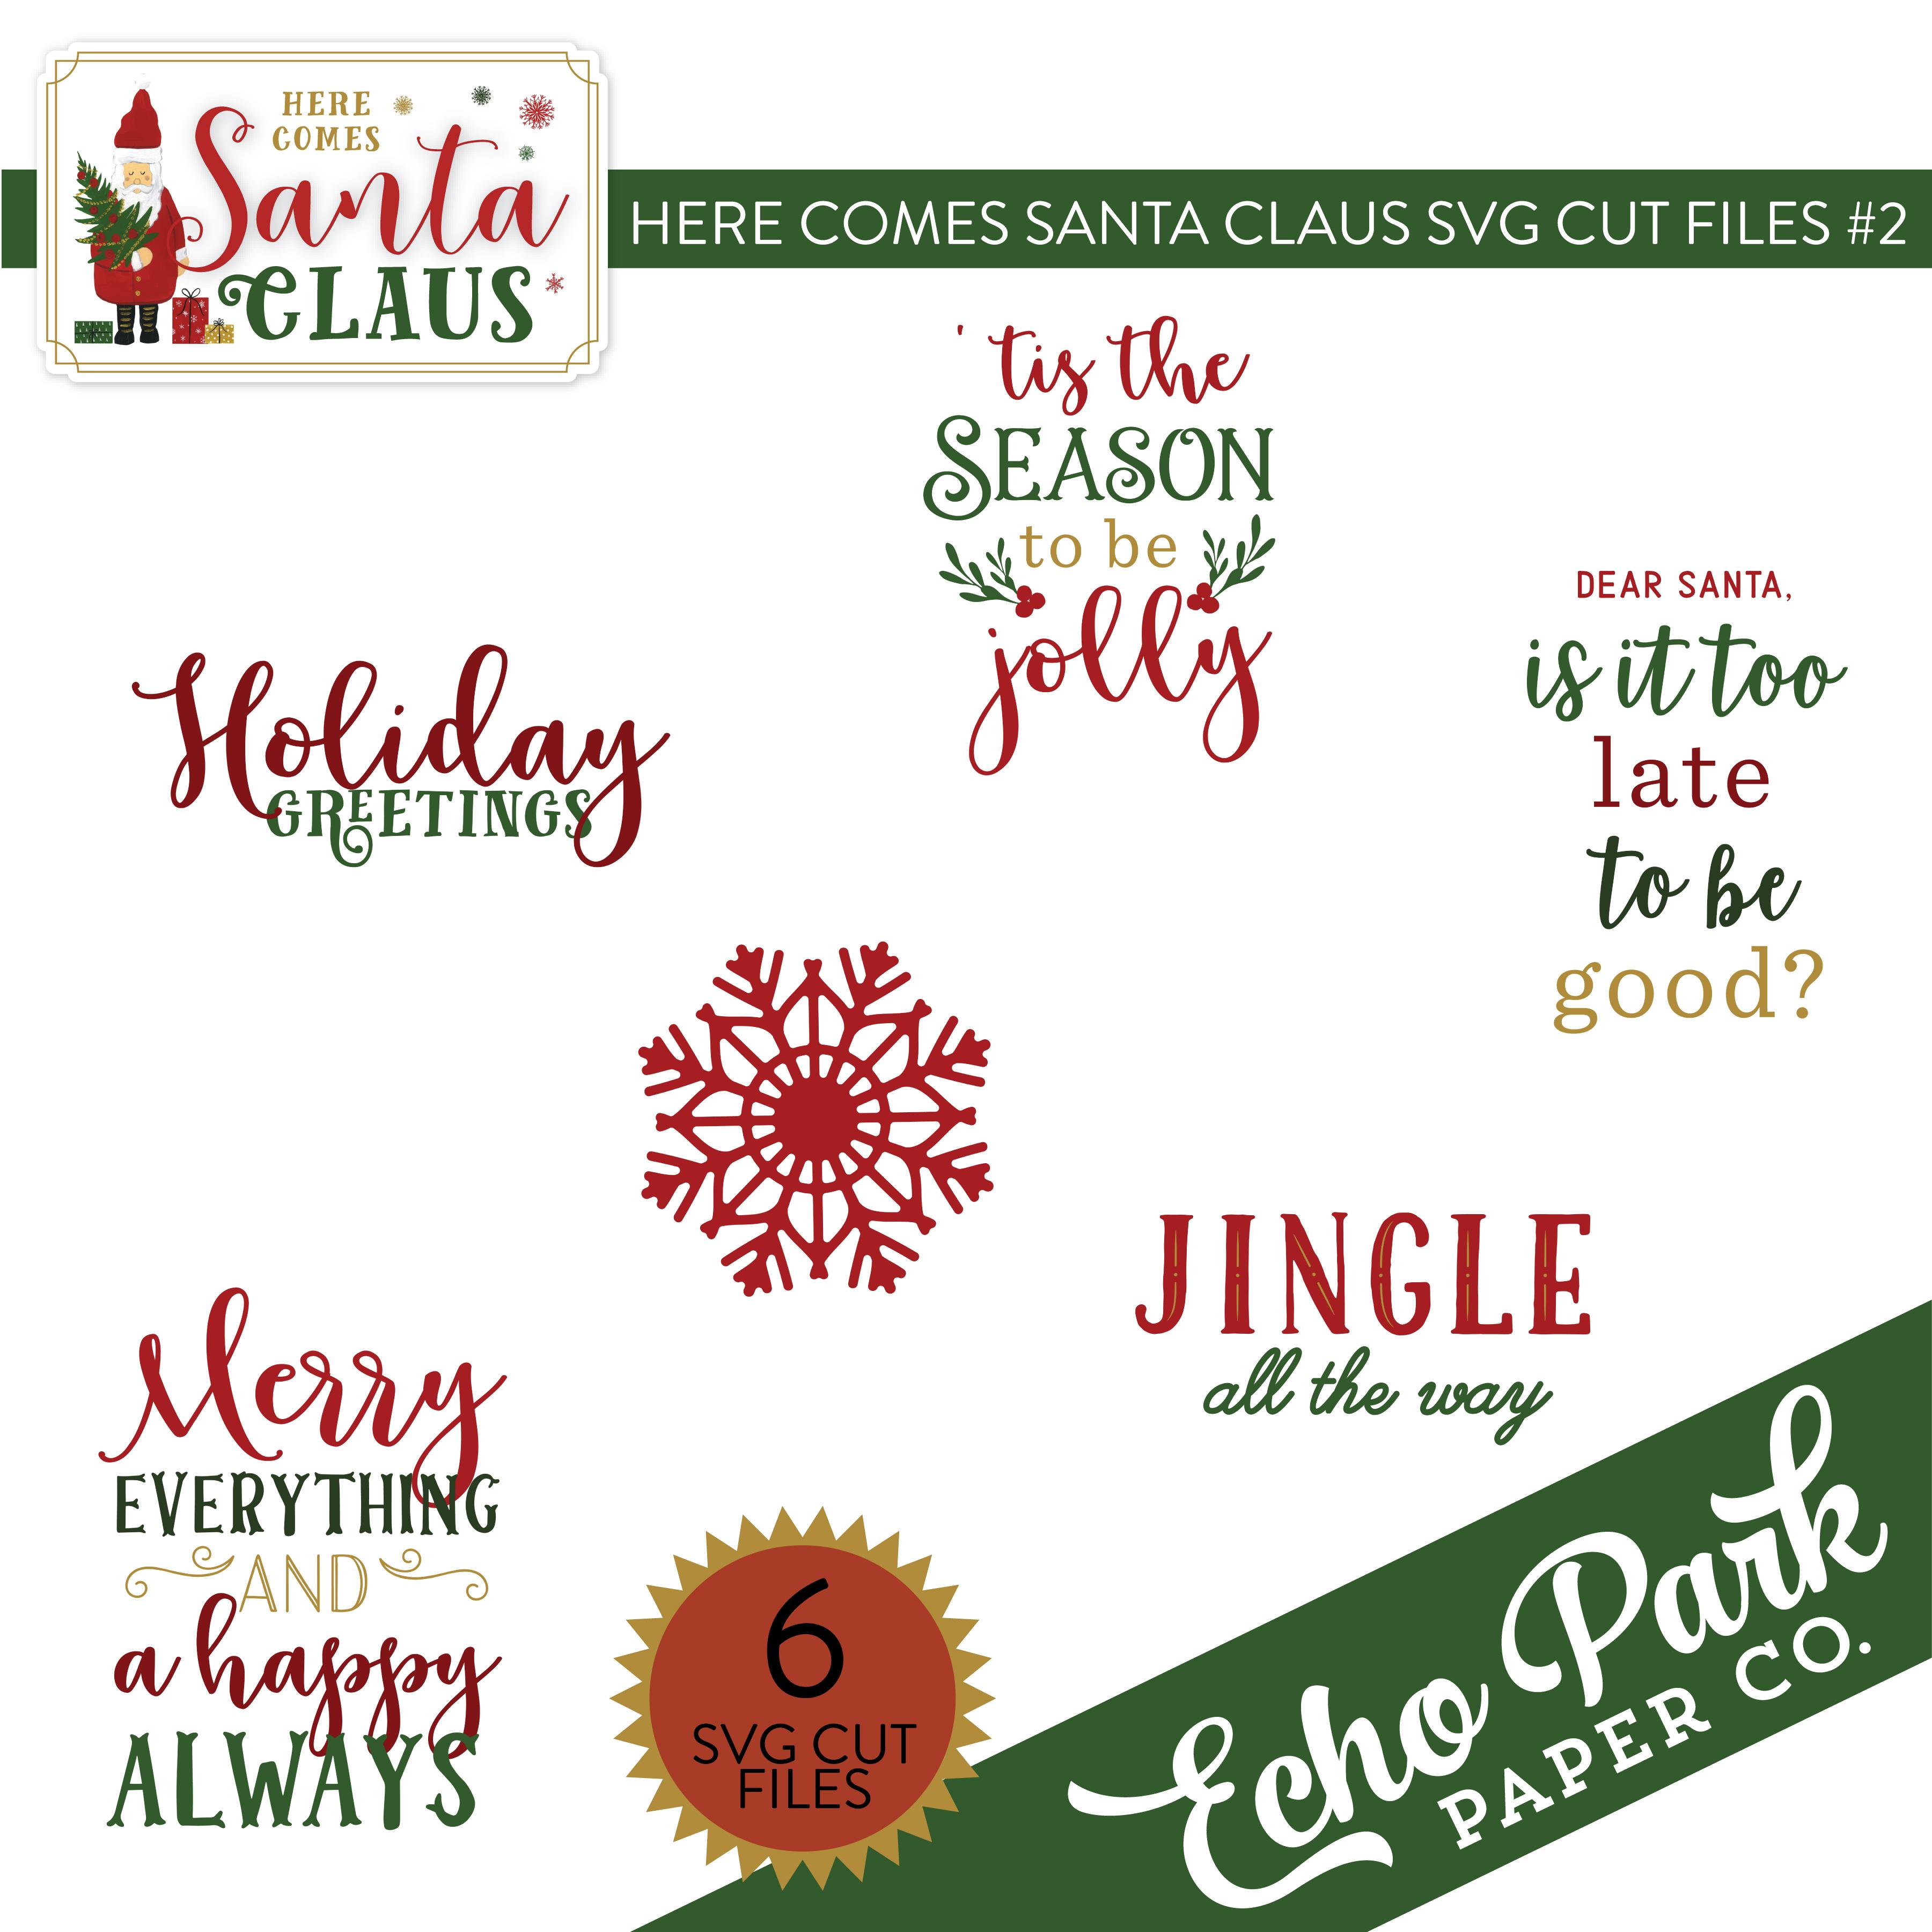 Here Comes Santa Claus SVG Cut Files #2